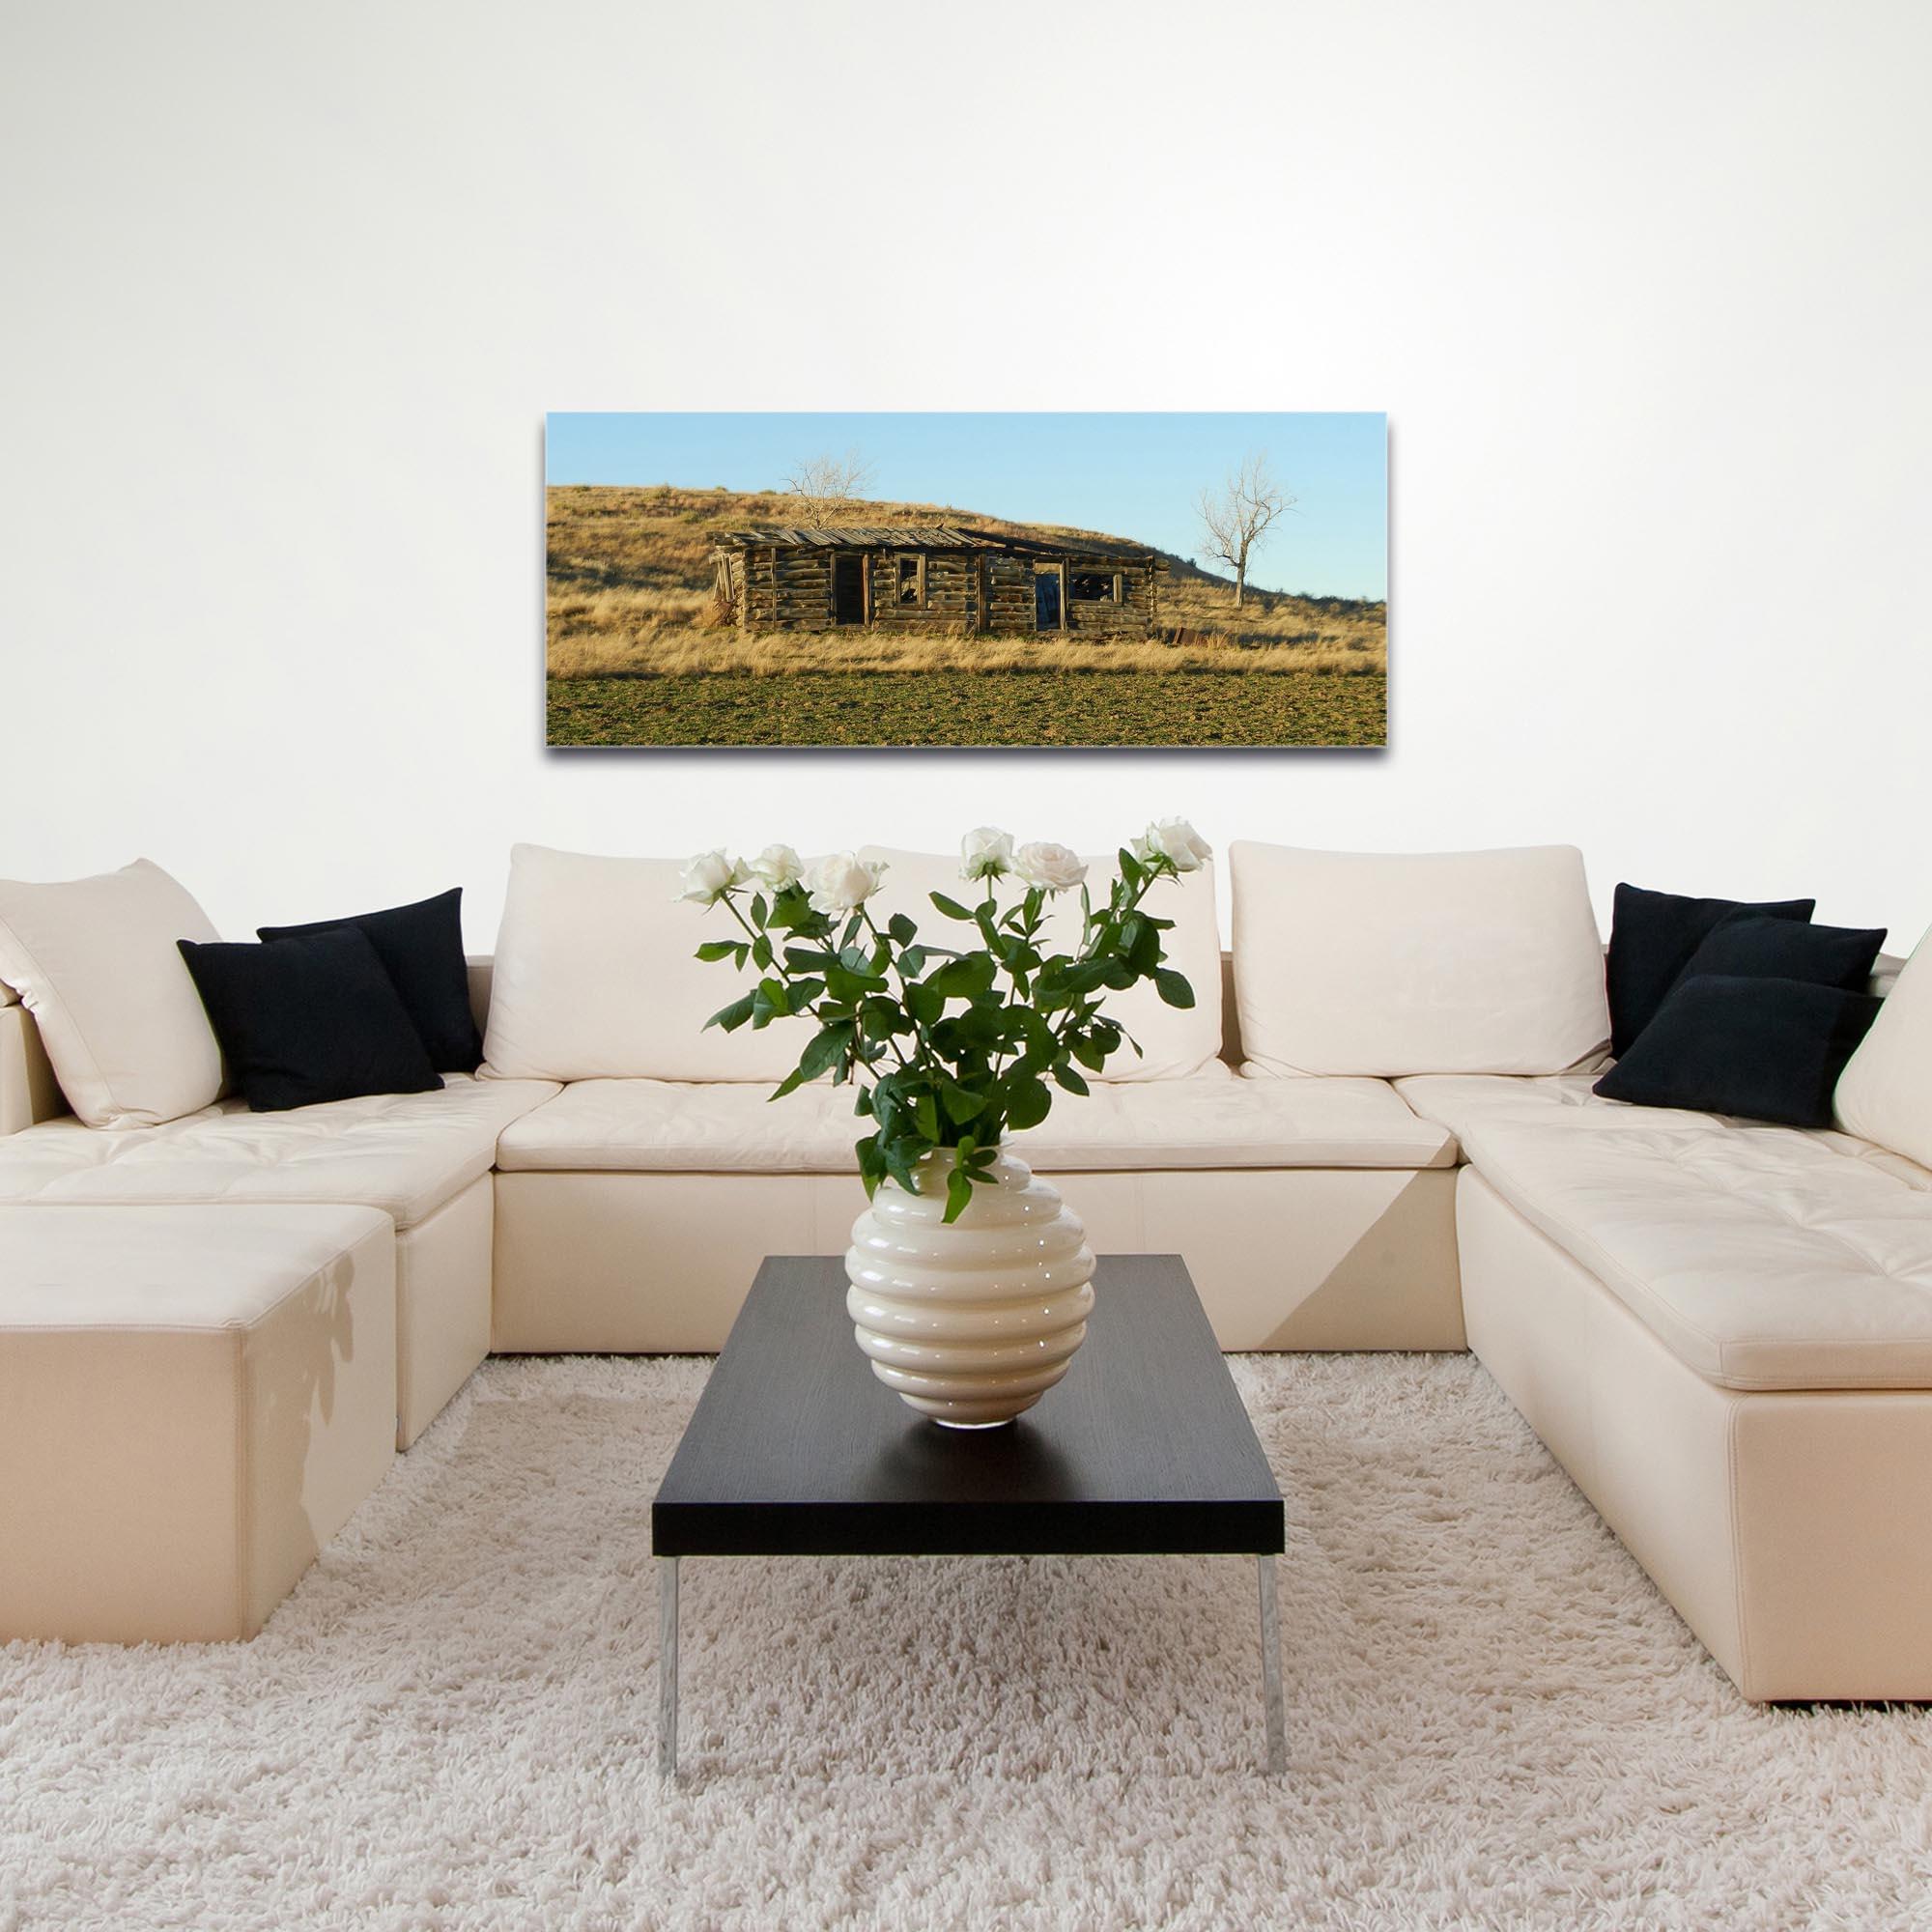 Western Wall Art 'The Hillside' - American West Decor on Metal or Plexiglass - Image 3